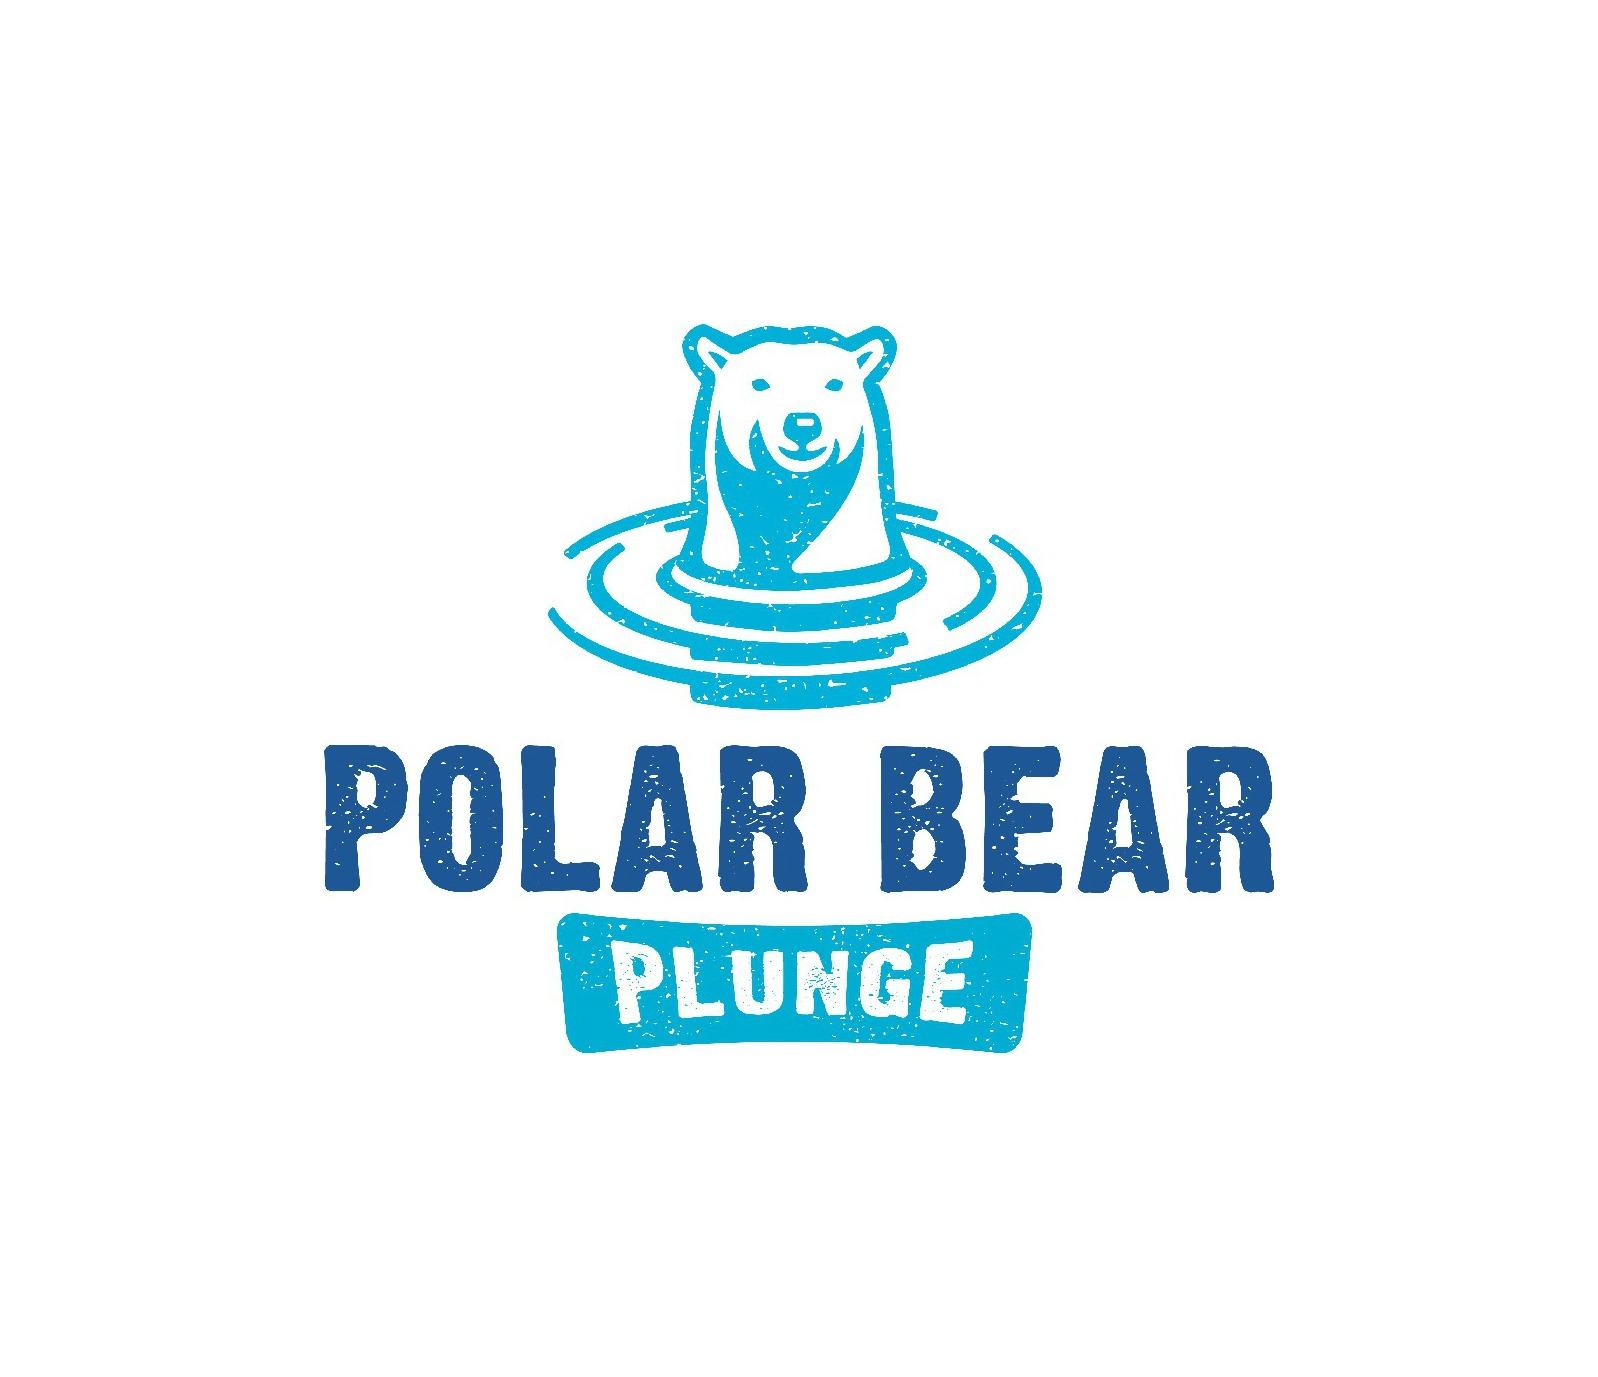 EarthCam To Livestream Seaside Heights Polar Bear Plunge